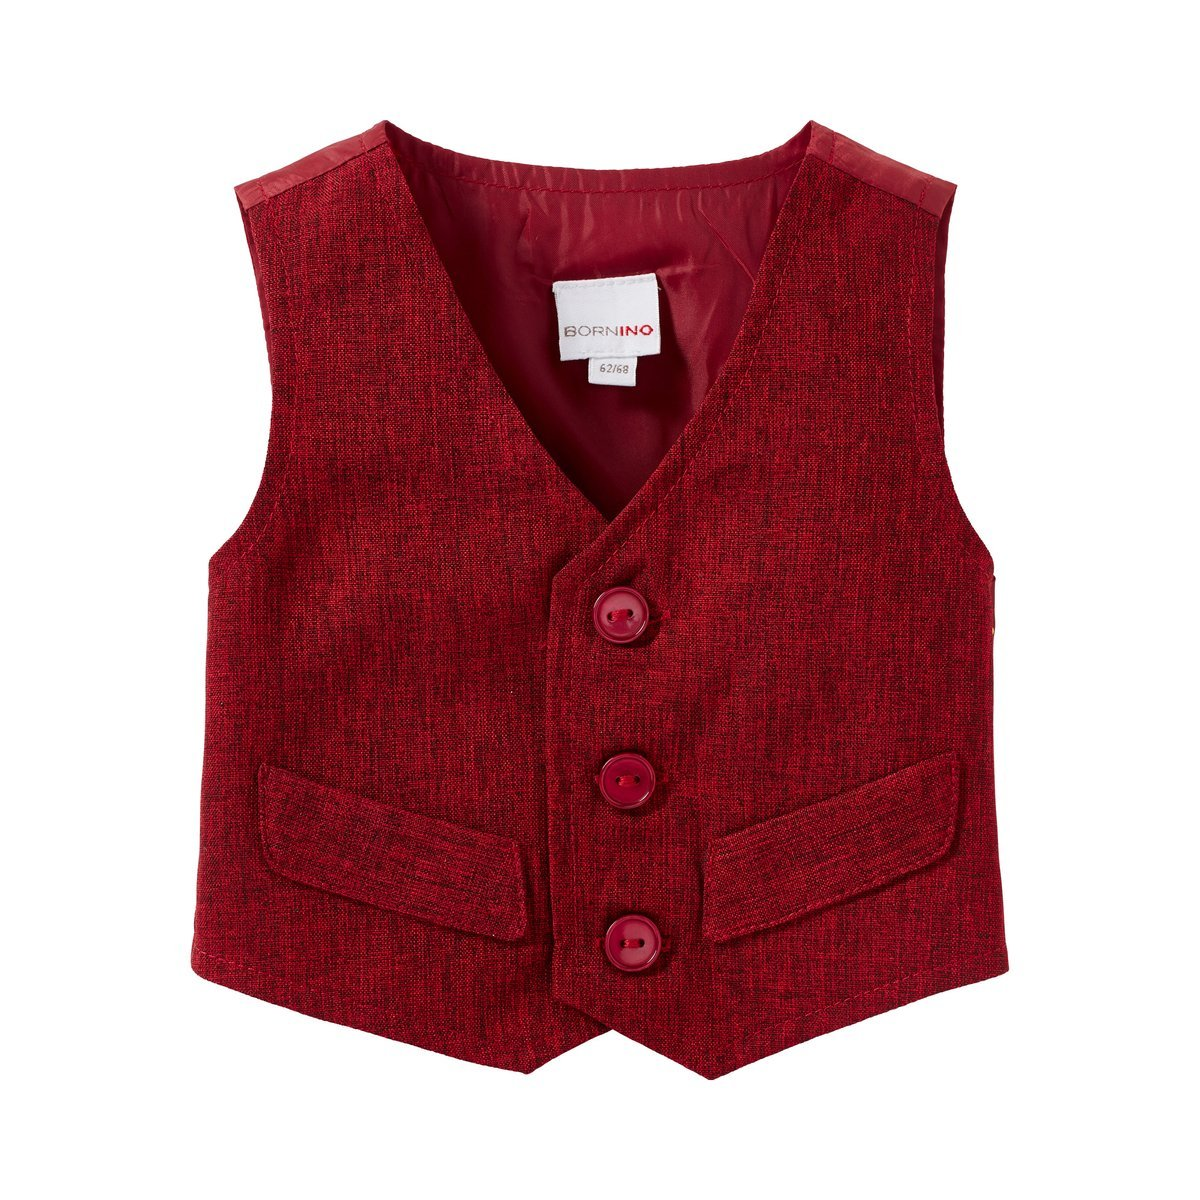 36e35386151ac Bornino 4-tlg. Set Festliche Mode/Babybekleidung Junge/Anzug/rot/weiß/schwarz:  Bornino: Amazon.de: Bekleidung